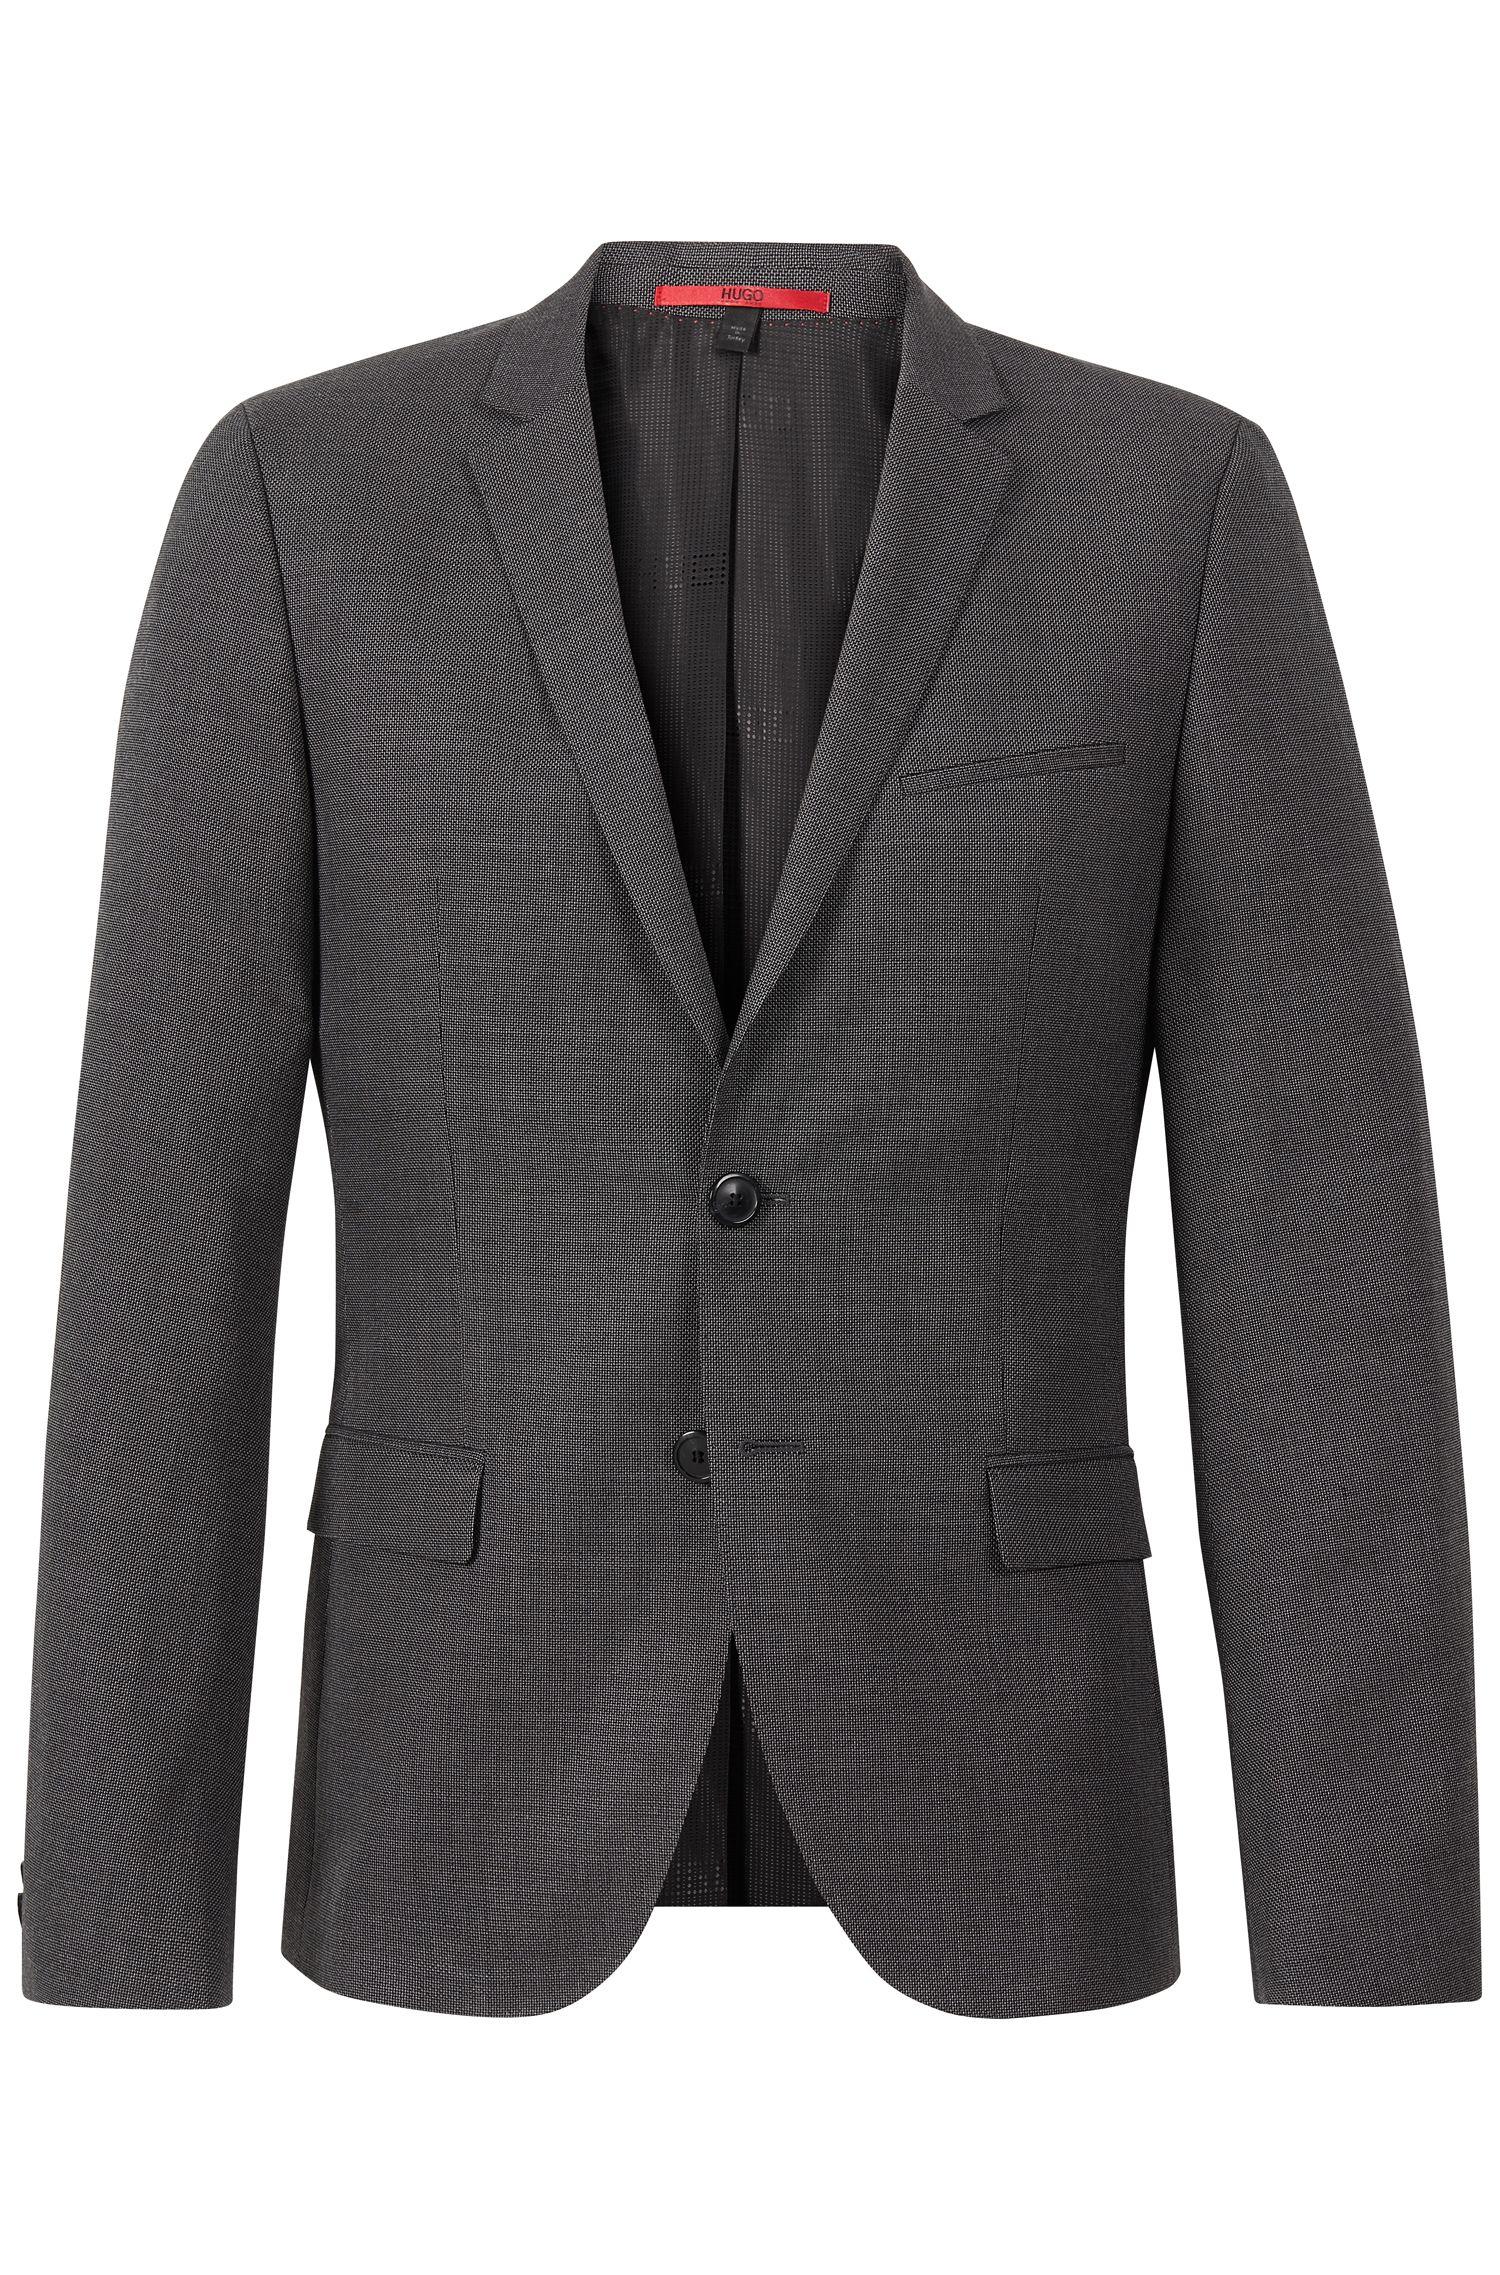 Virgin Wool Cotton Nailhead Sport Coat, Slim Fit | Arti